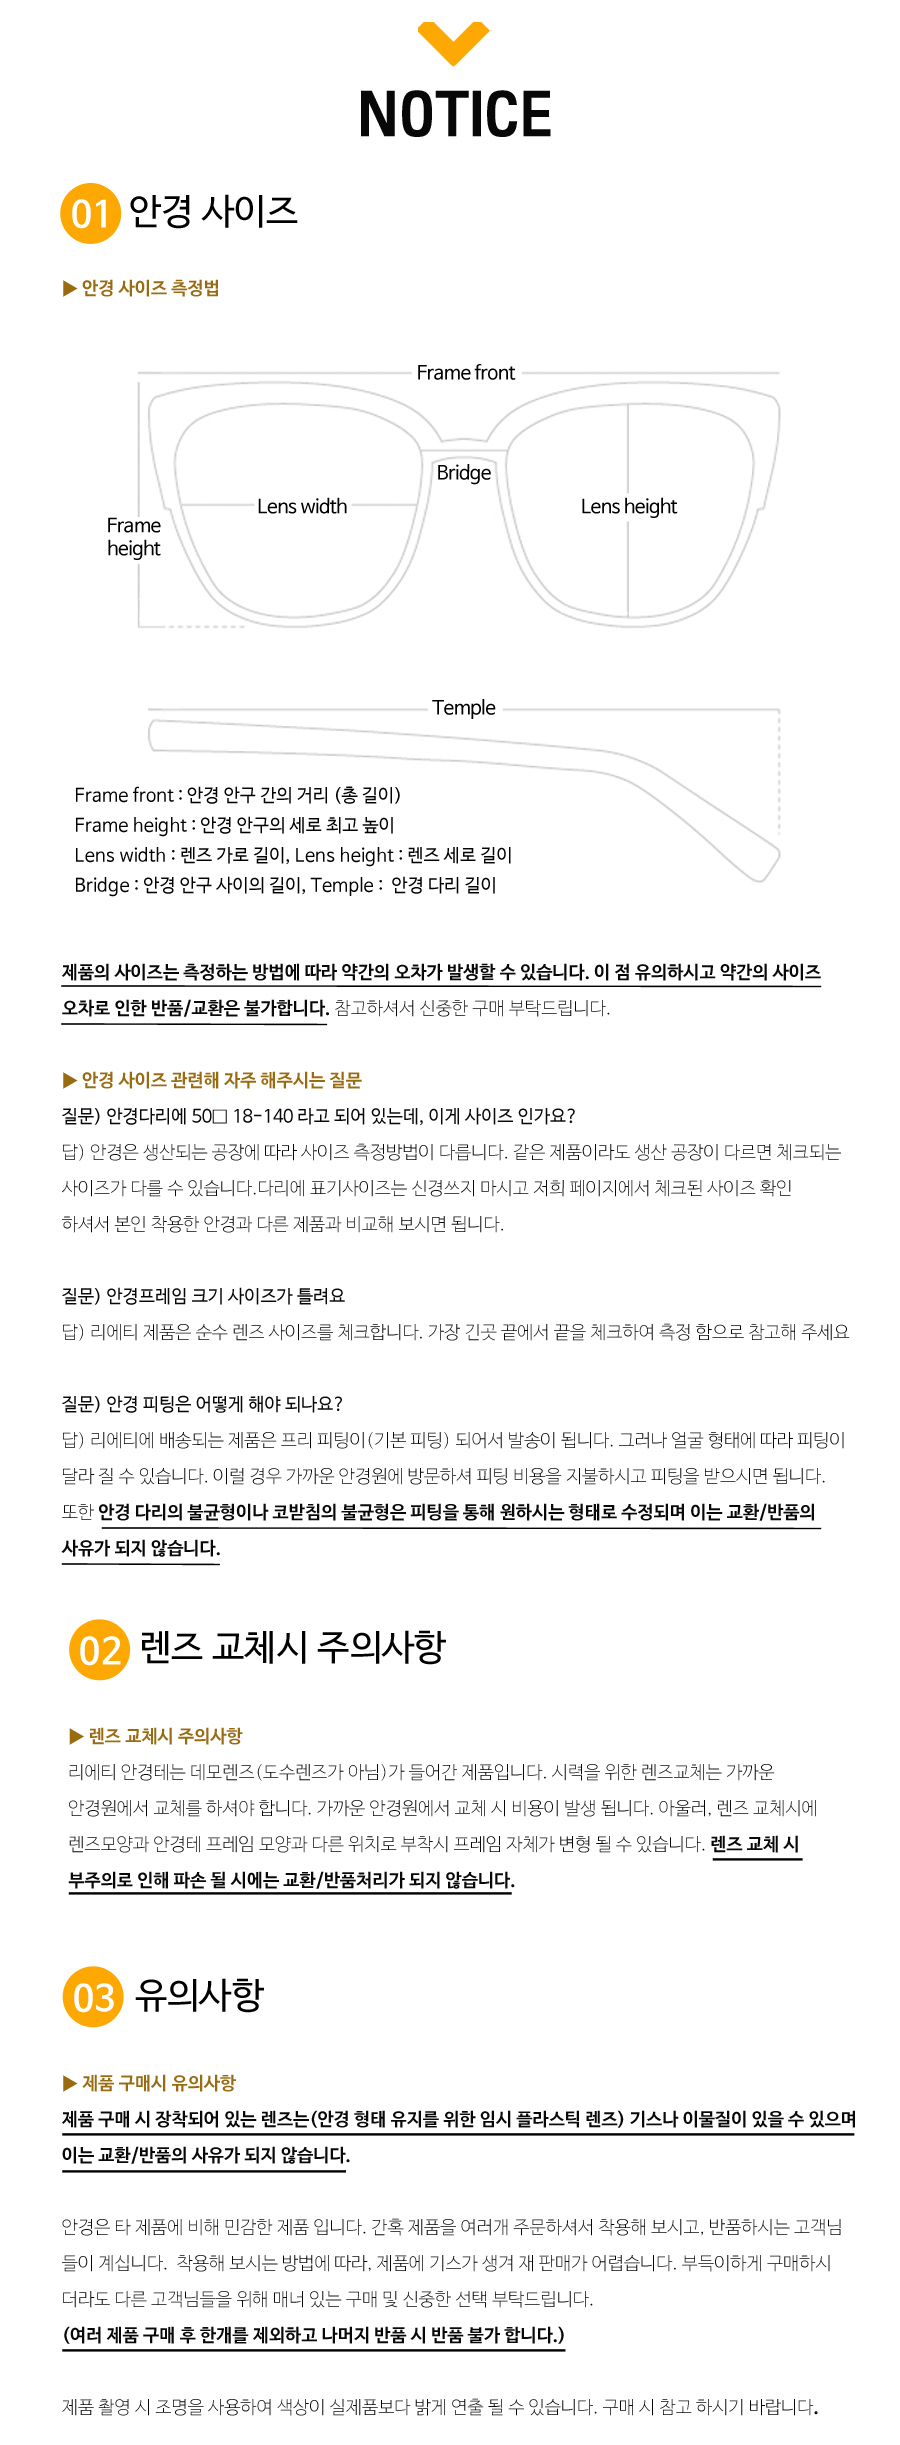 MELODIC RTG C3013 C5 (골드) 청광차단 남녀공용 패션안경테 - 리에티, 59,000원, 안경/선글라스, 안경